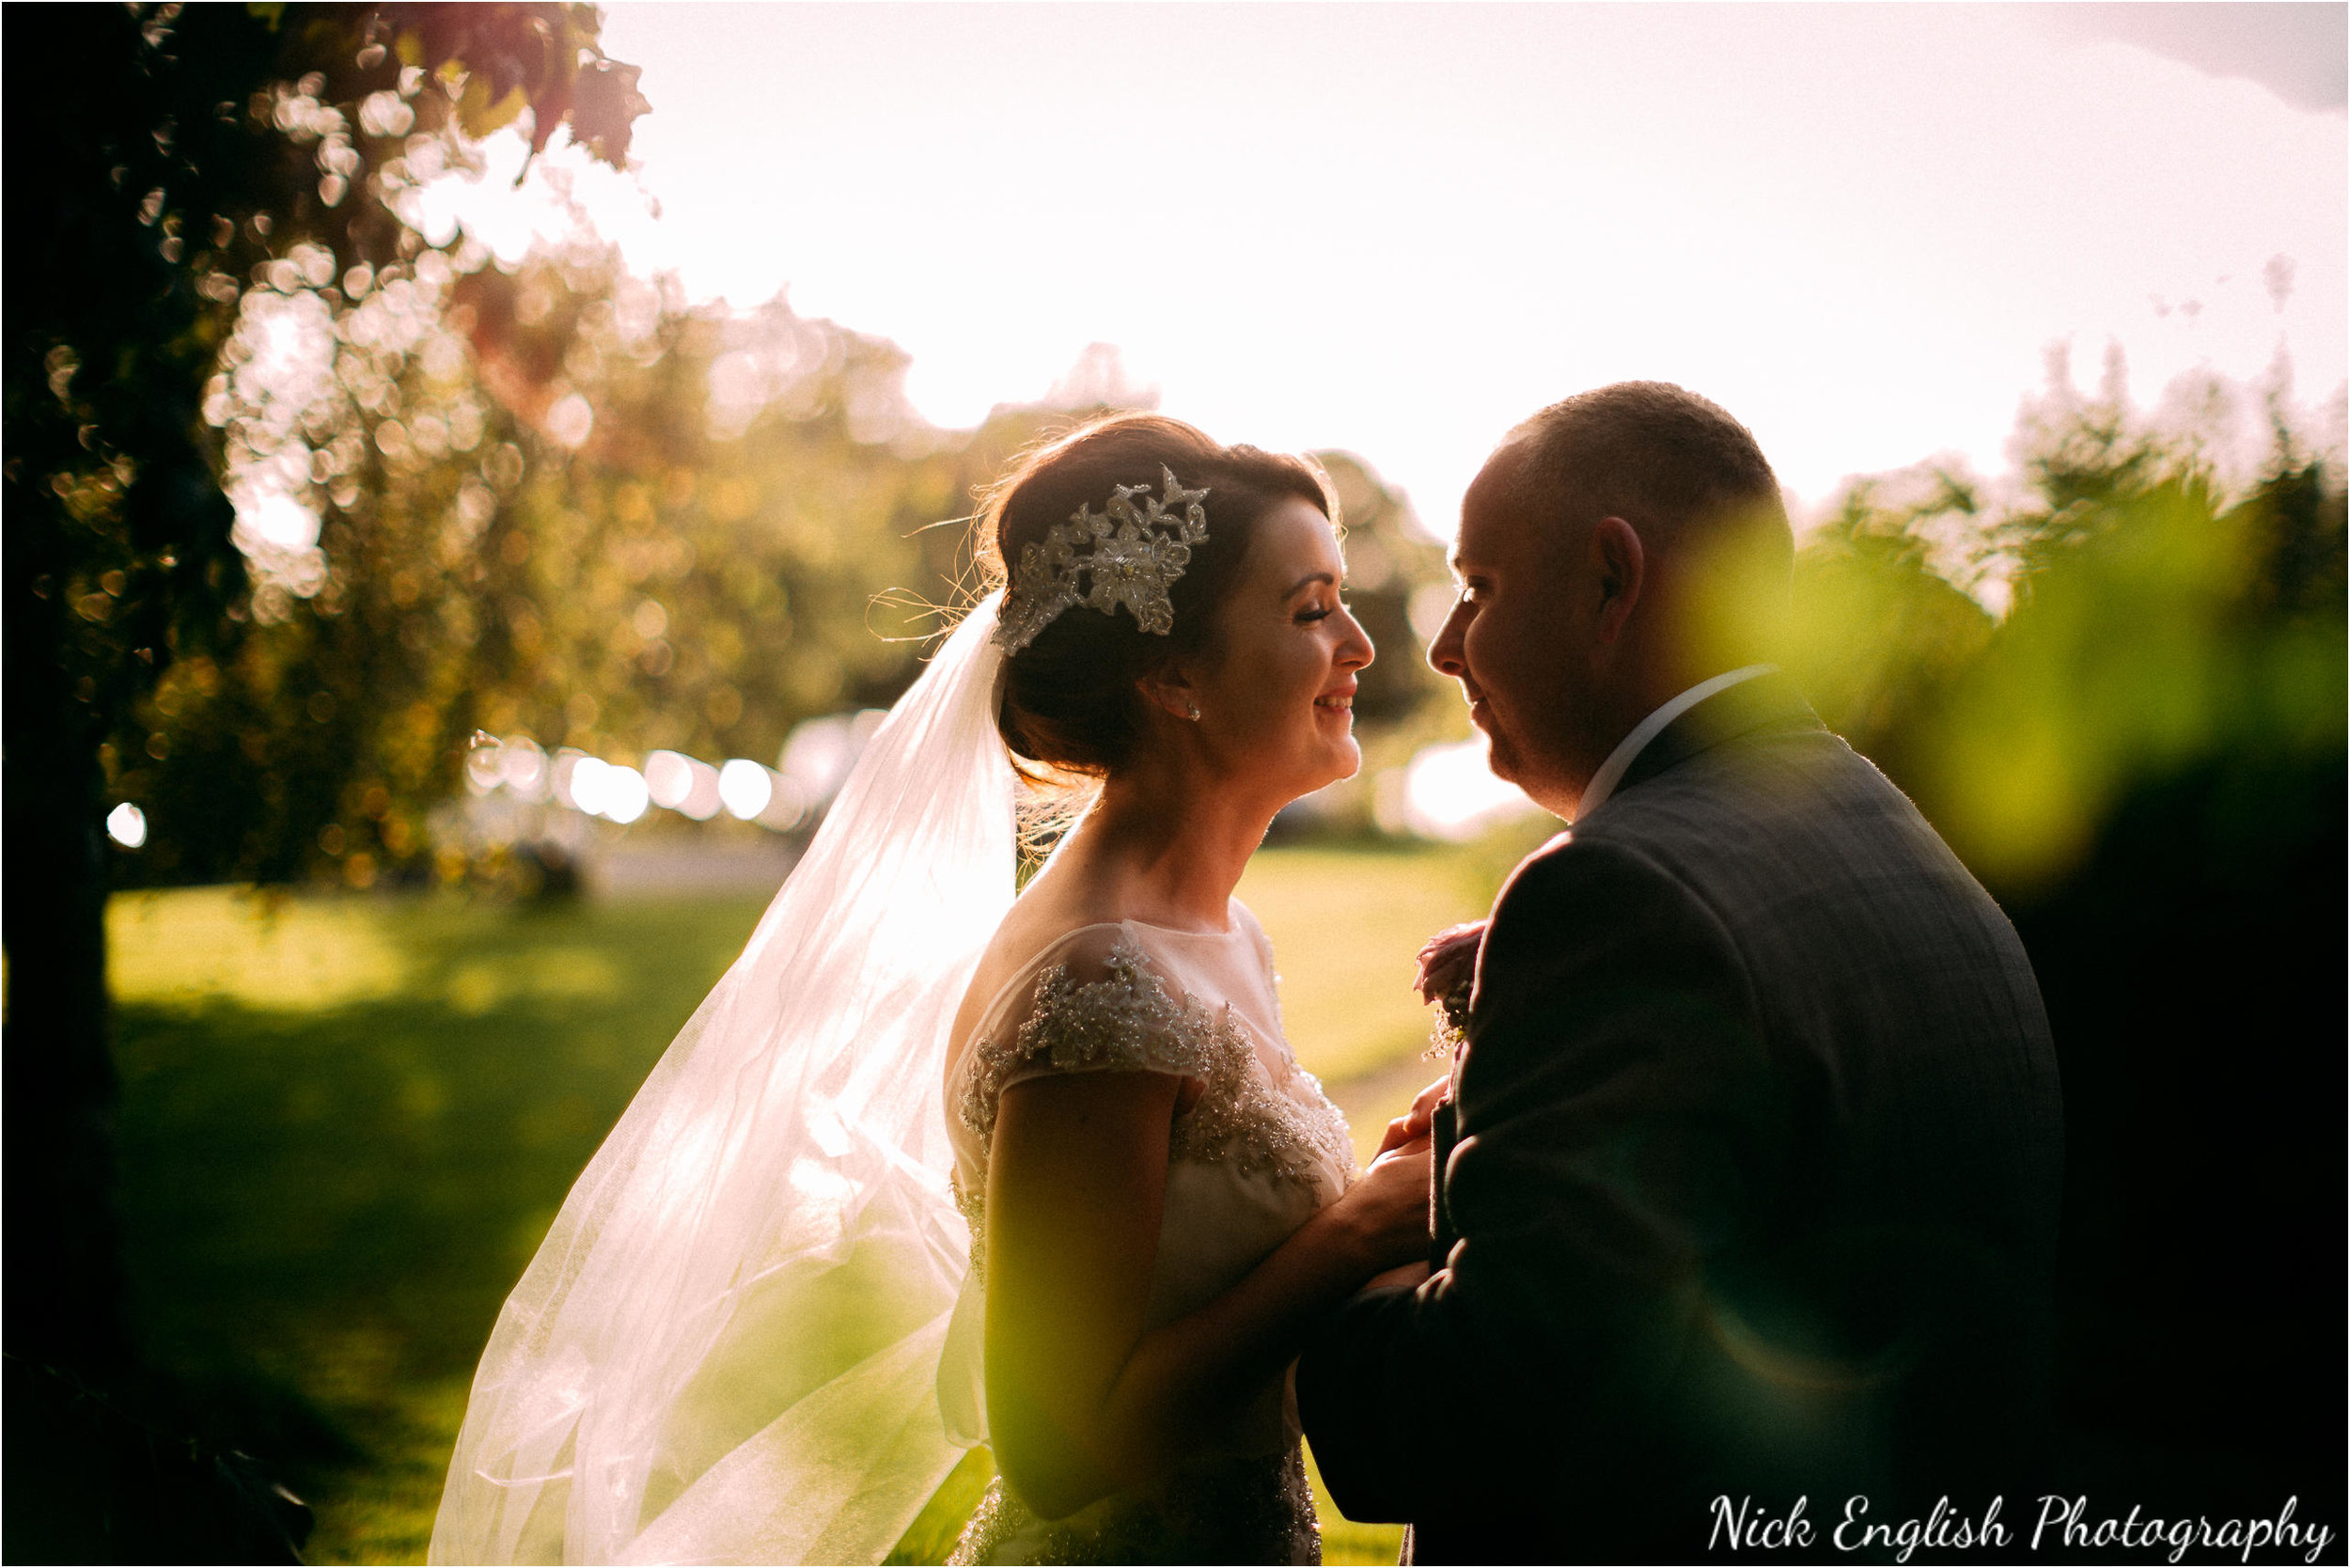 Stacey-Ash-Wedding-Photographs-Stanley-House-Preston-Lancashire-214.jpg